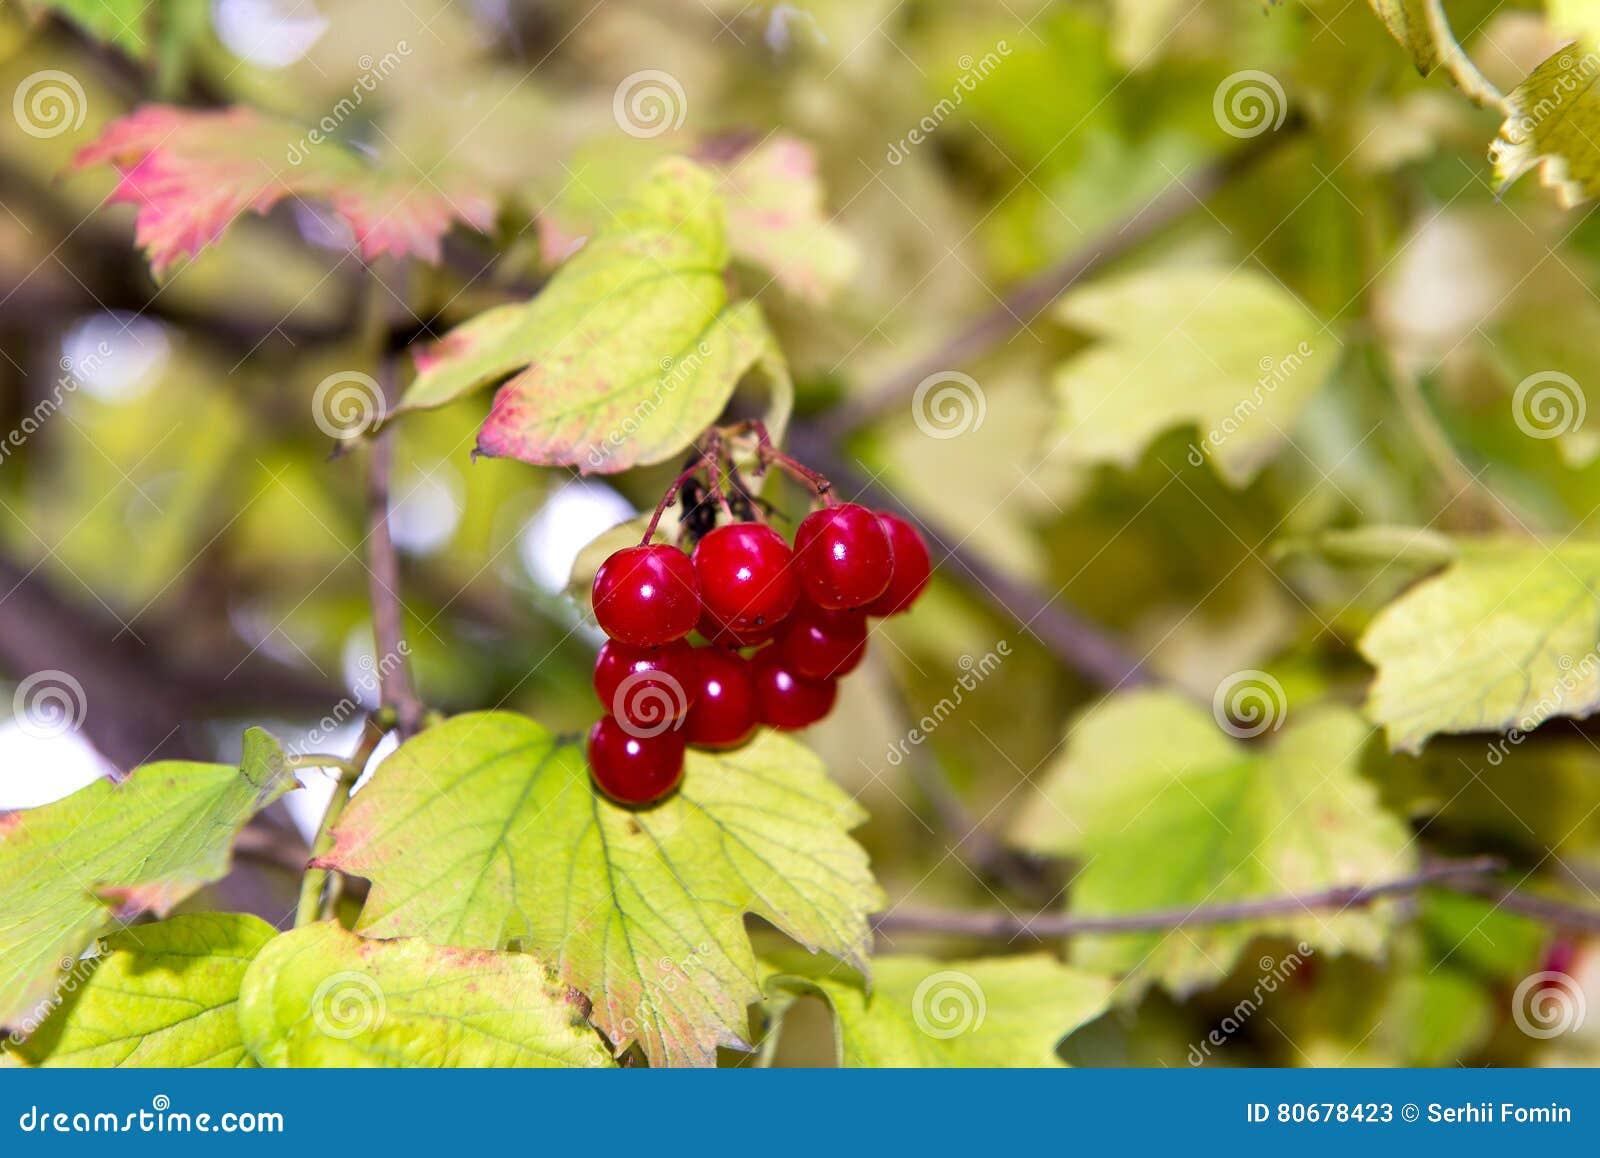 Branch of red viburnum in the garden. Bright red viburnum bunches in the autumn garden. Collection of raspberry harvest.